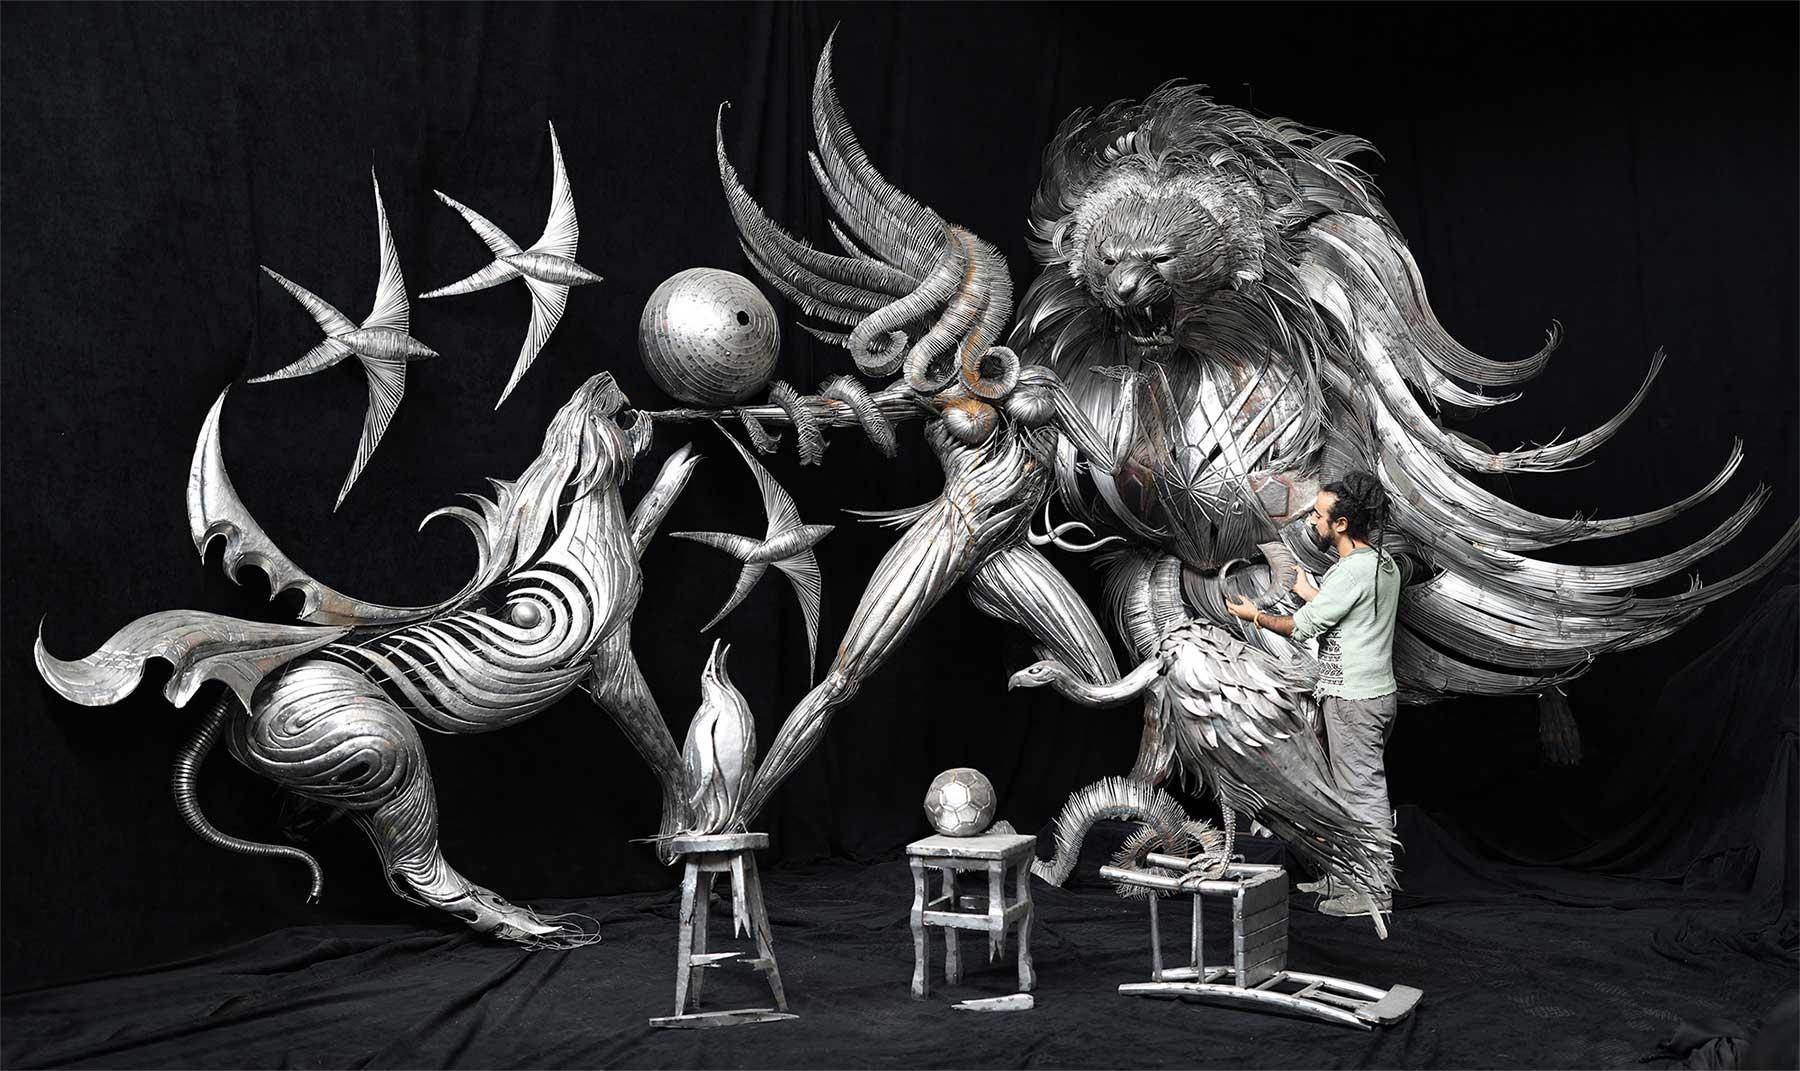 Geniale Altmetall-Skulpturen von Selçuk Yılmaz selcuk-yilmaz-metallskulpturen-2020_01